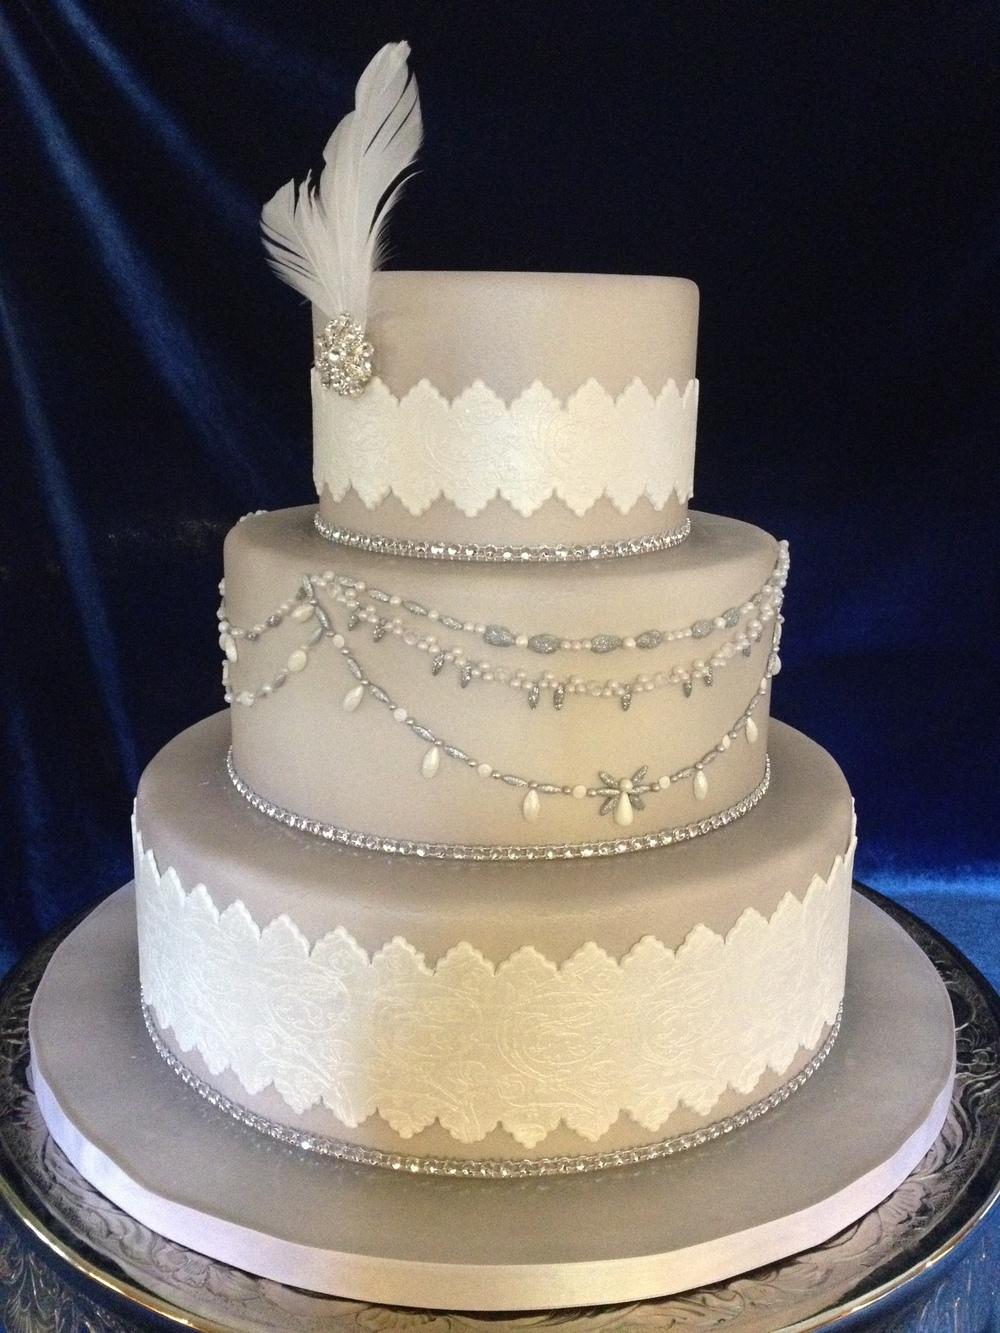 Gatsby-inspired wedding cake from Cakes by Linda (www.cakesbylinda.com)